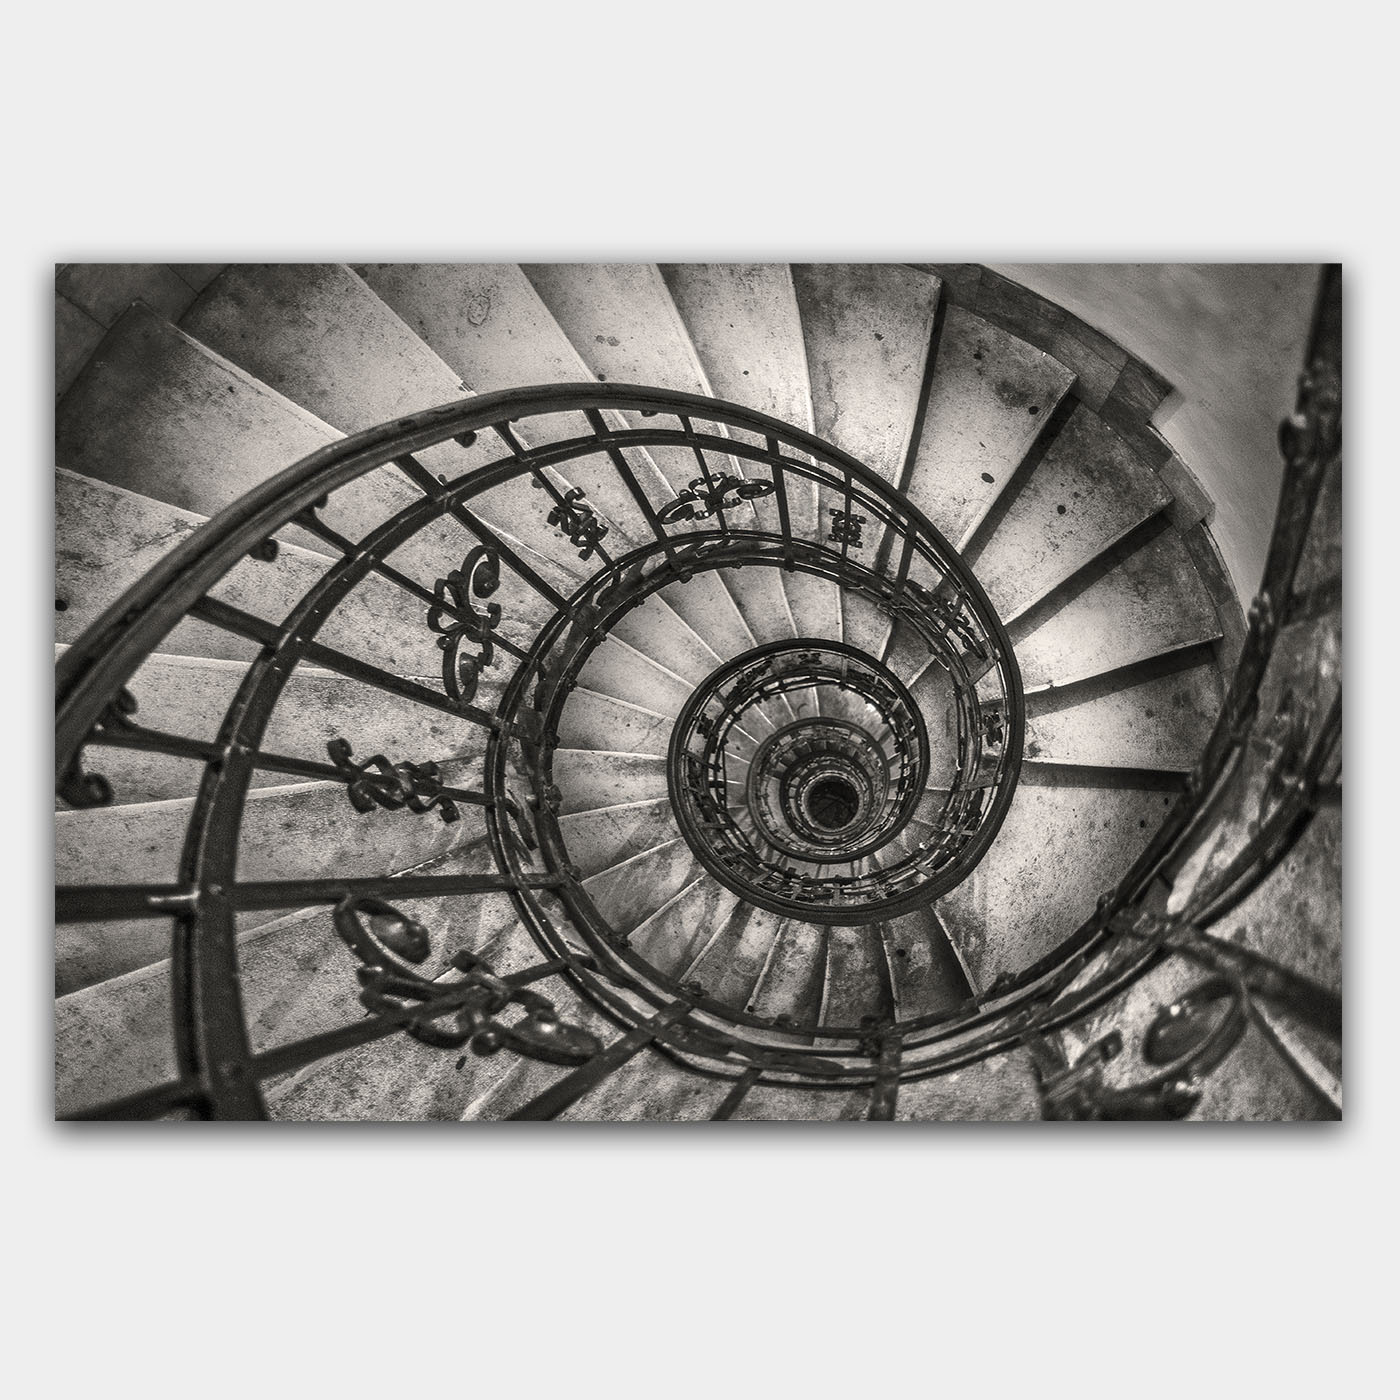 Spiral Staircase, Hungary - Martin Bisof | Photography